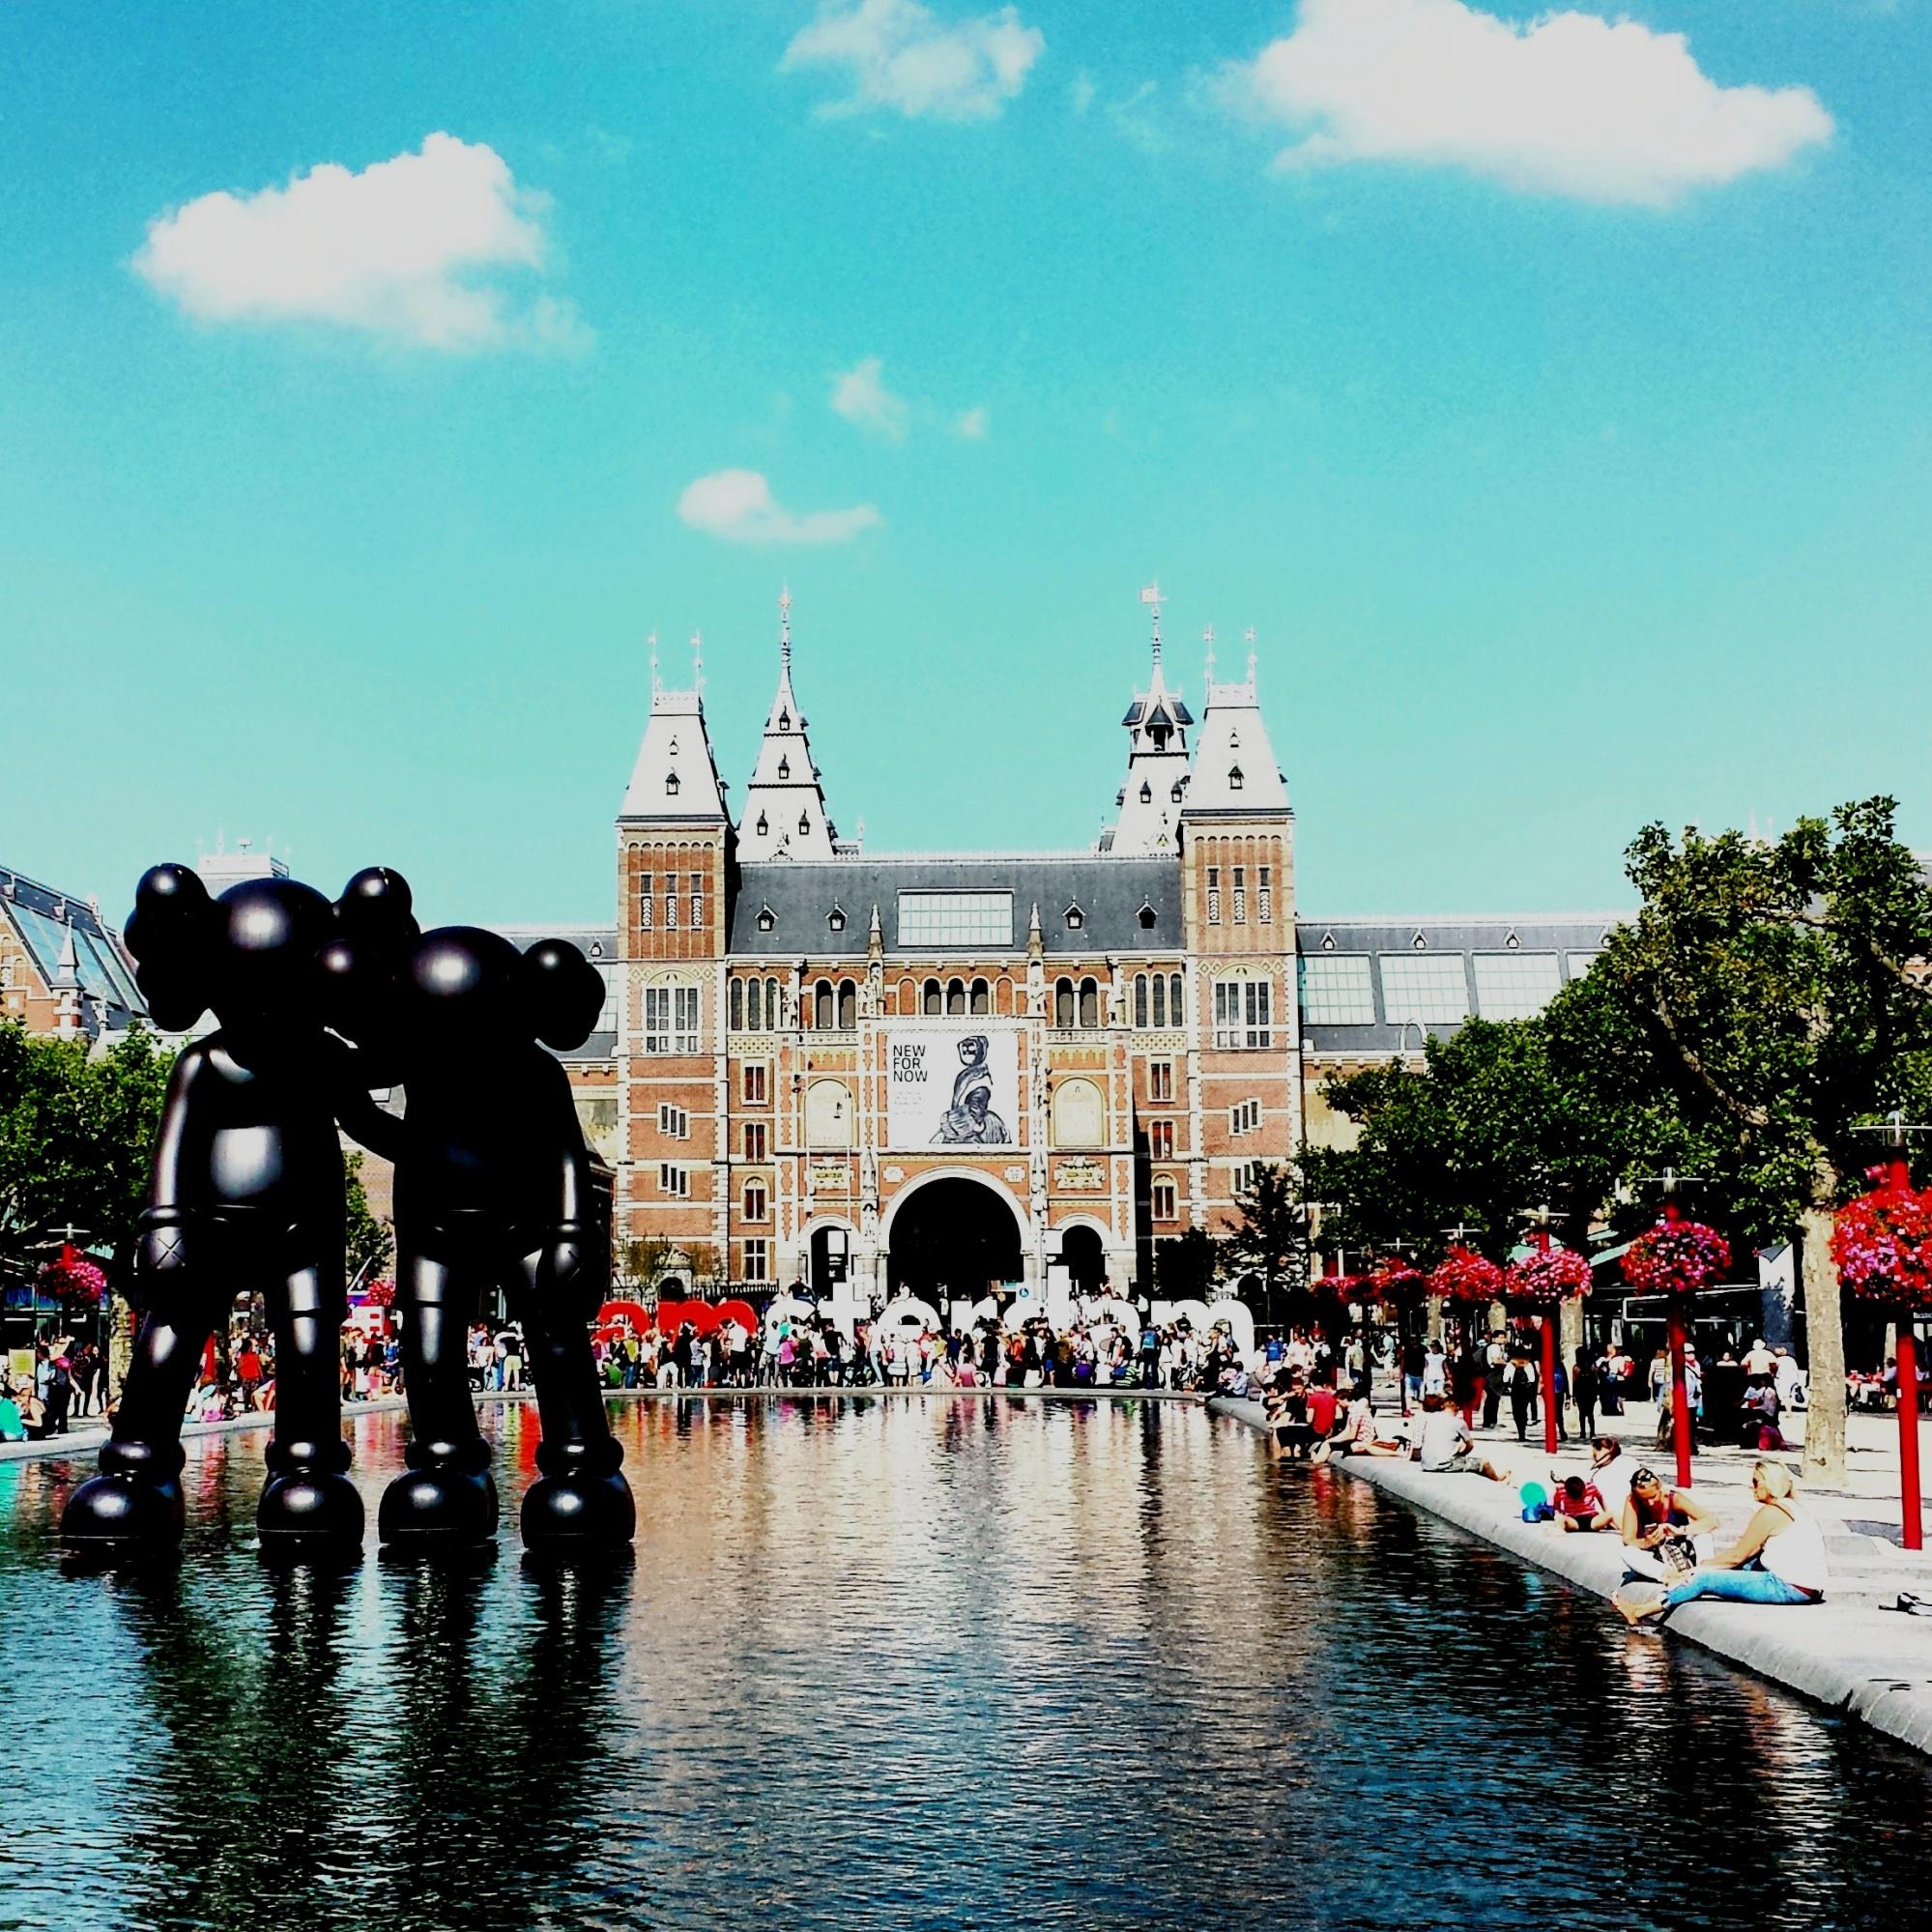 Amsterdam Rijksmuseum by day